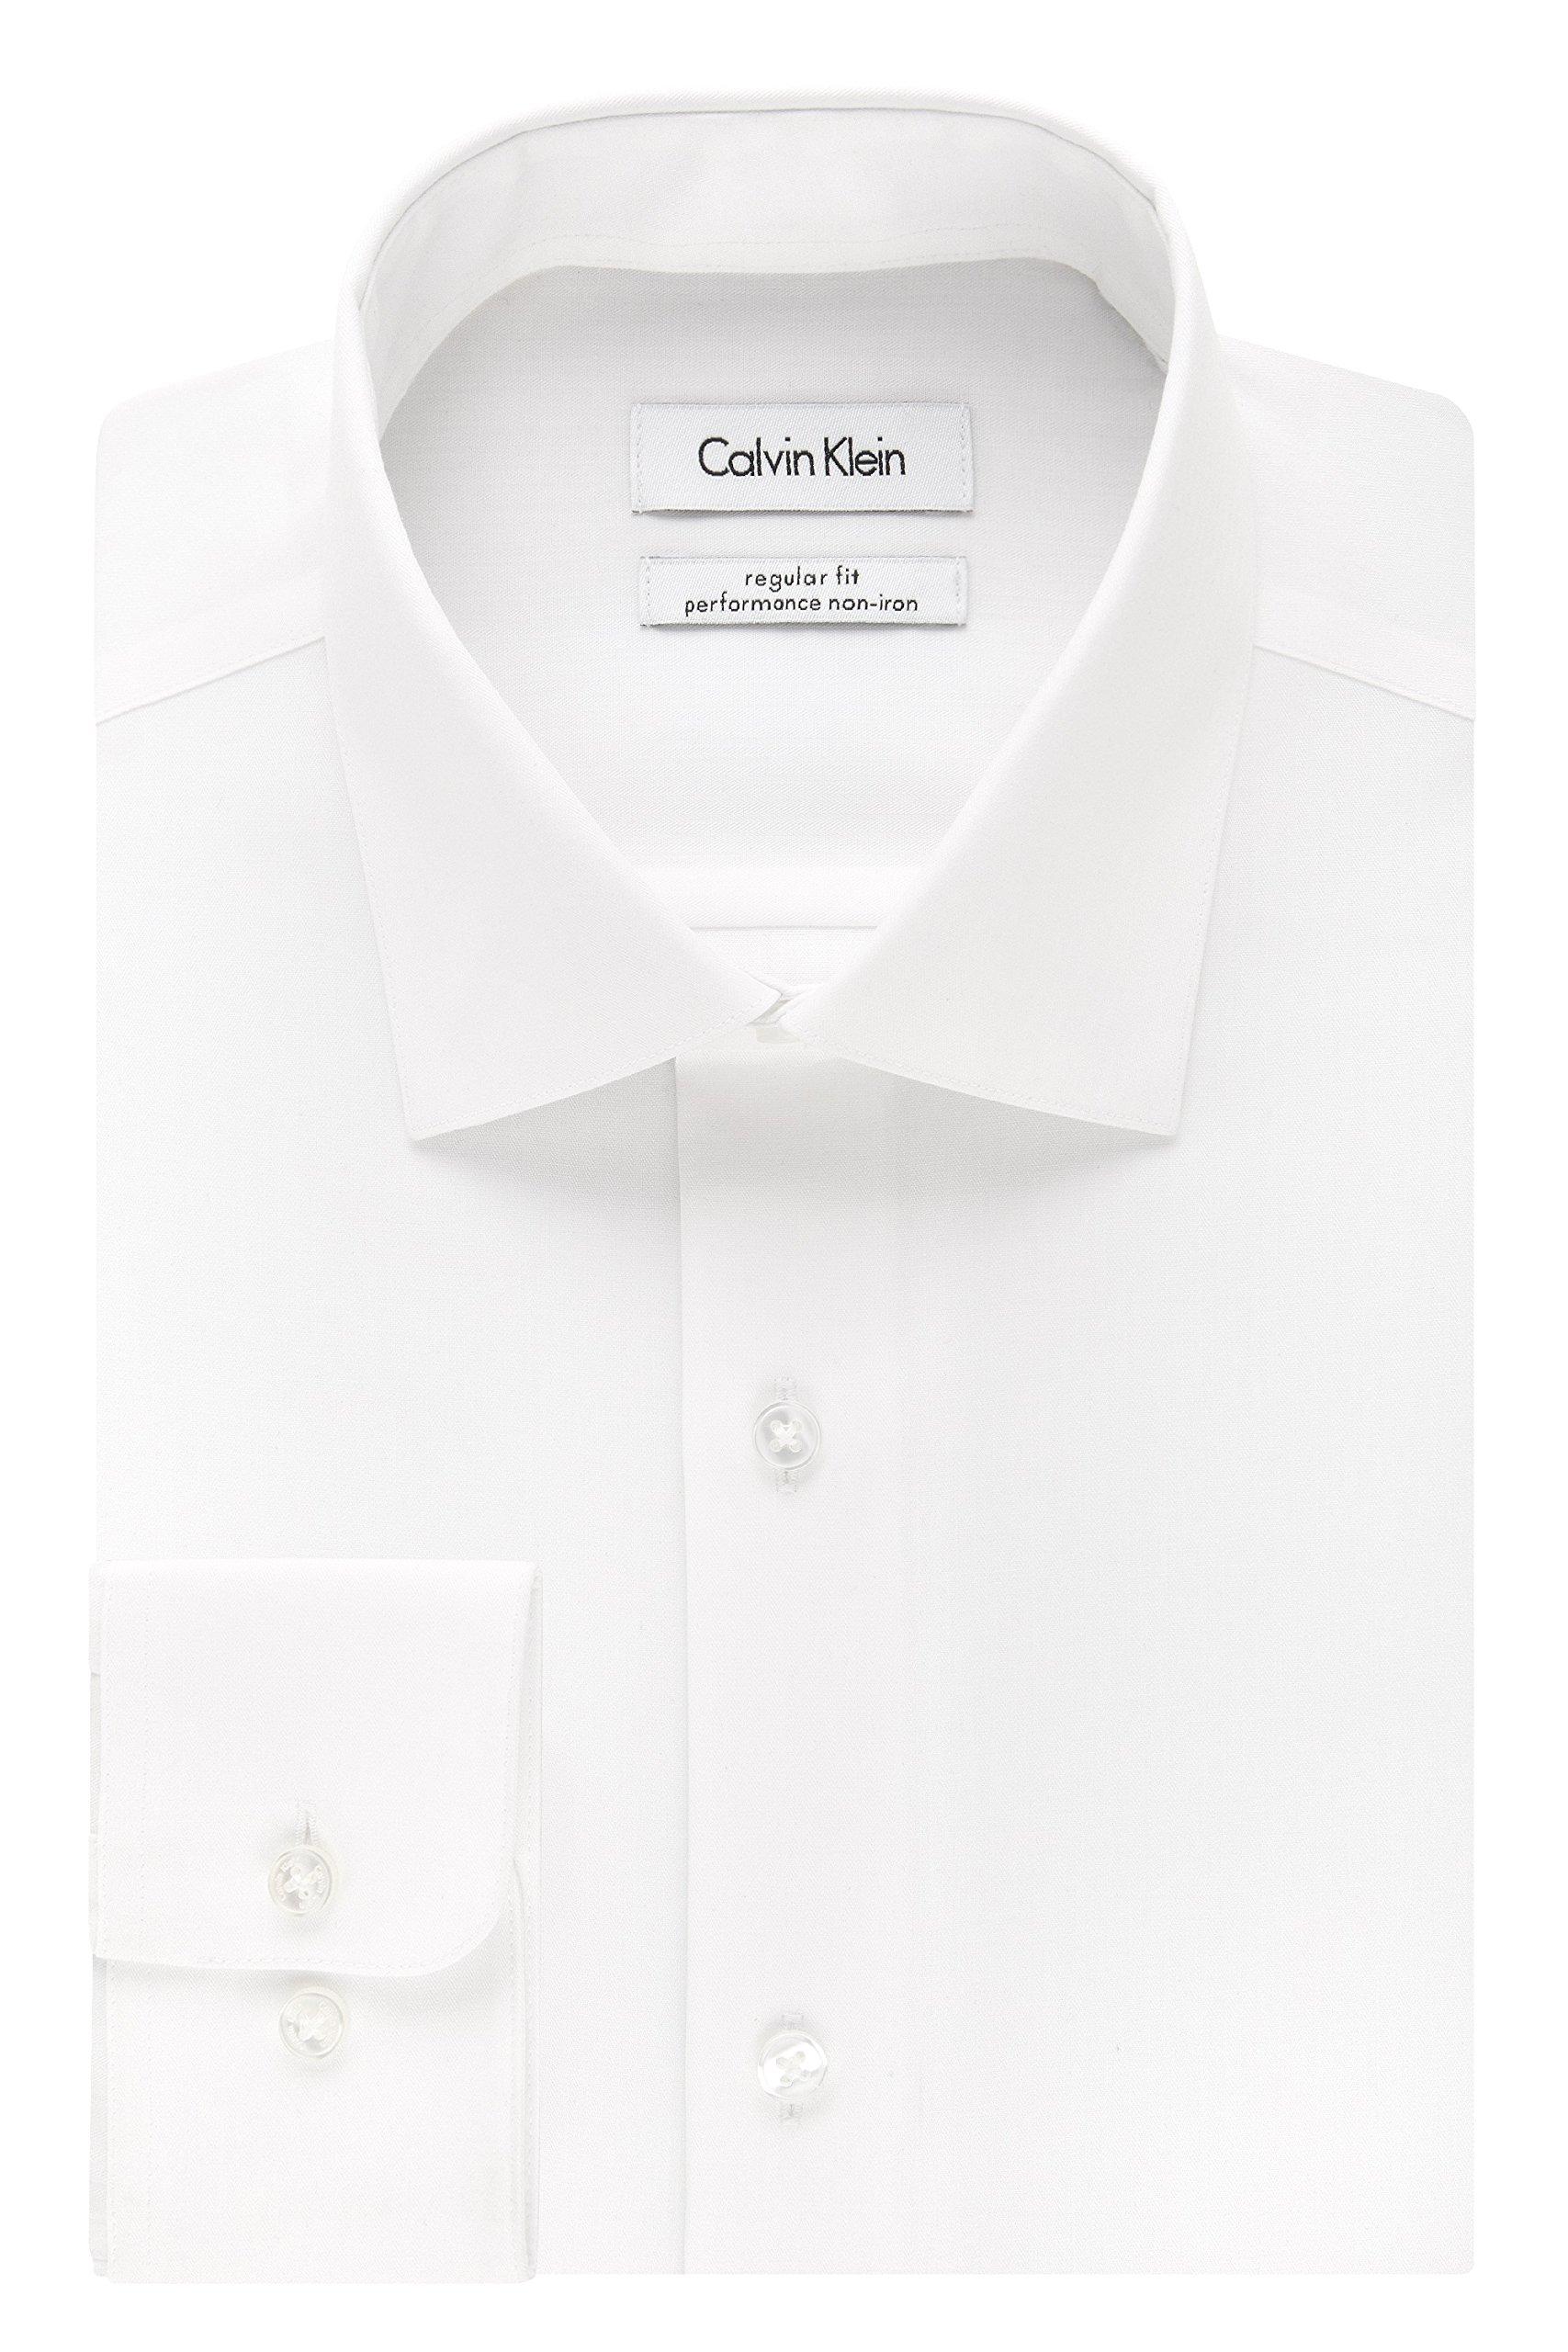 Calvin Klein Men's Regular Fit Non Iron Herringbone Spread Collar Dress Shirt, White, 16.5'' Neck 32''-33'' Sleeve